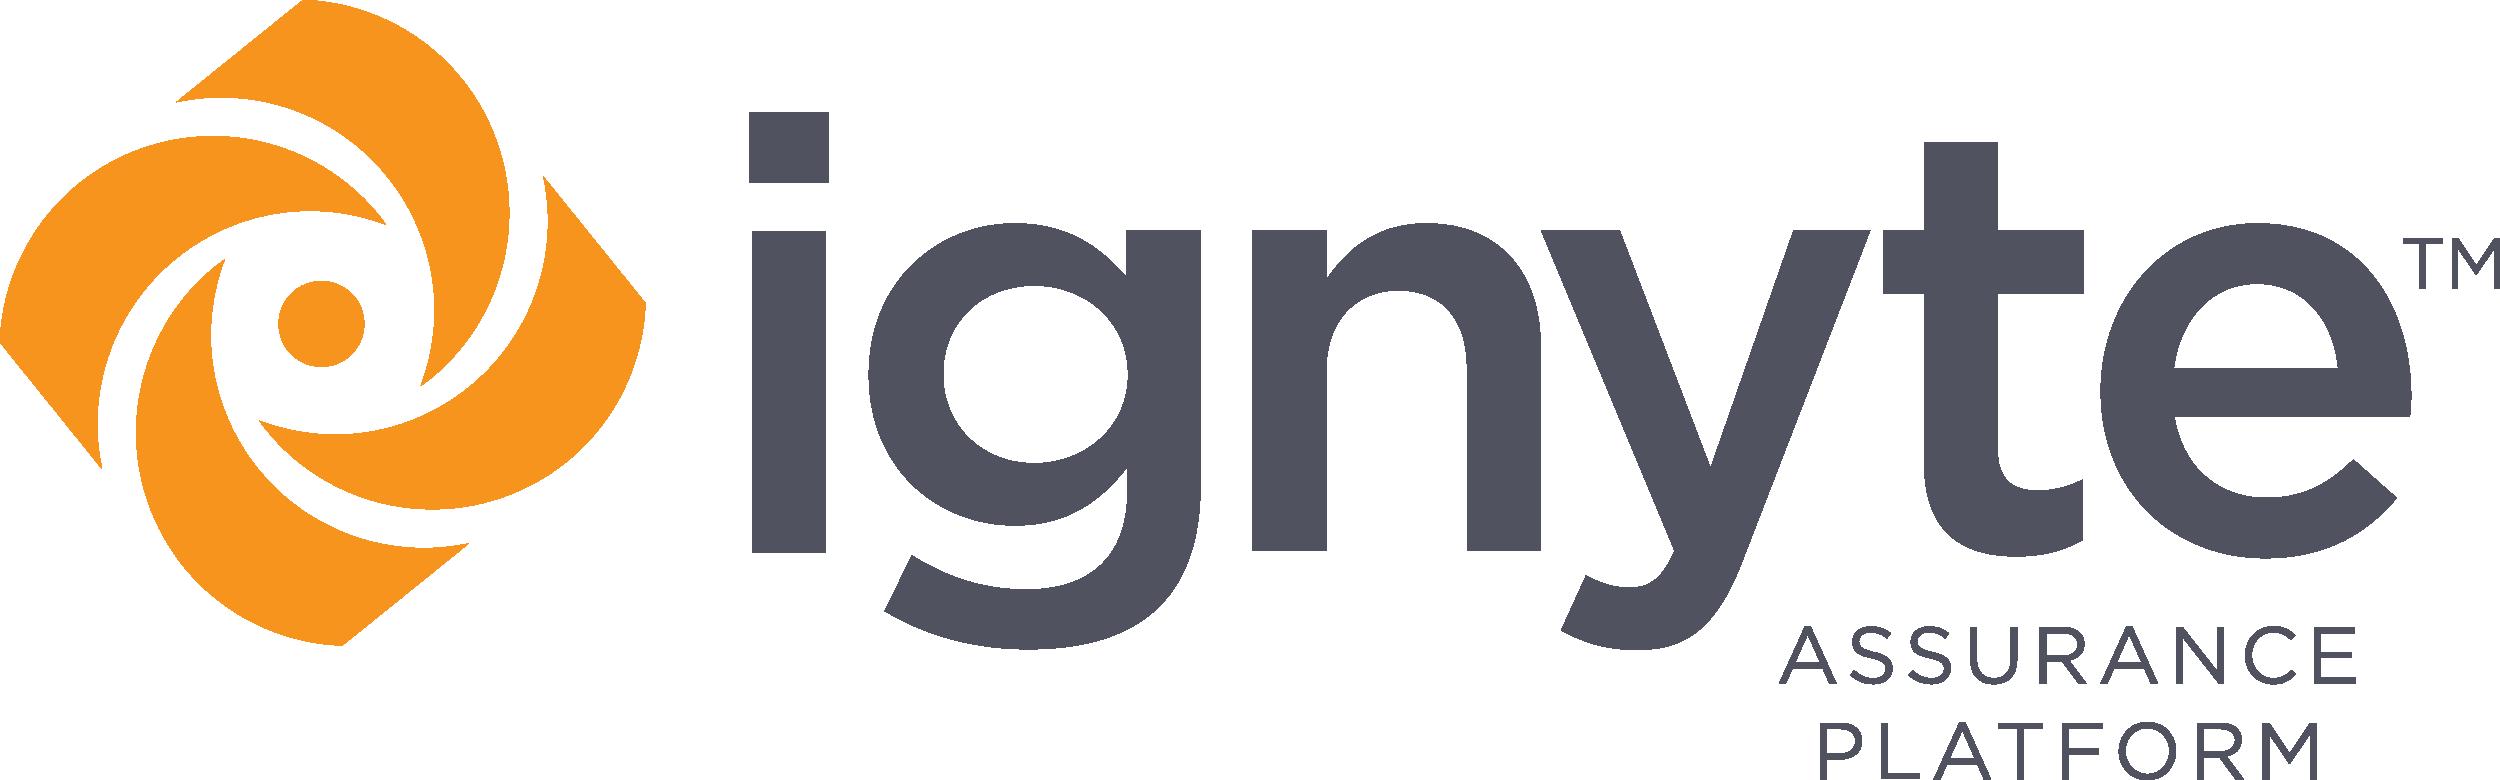 Ignyte Assurance Platform logo